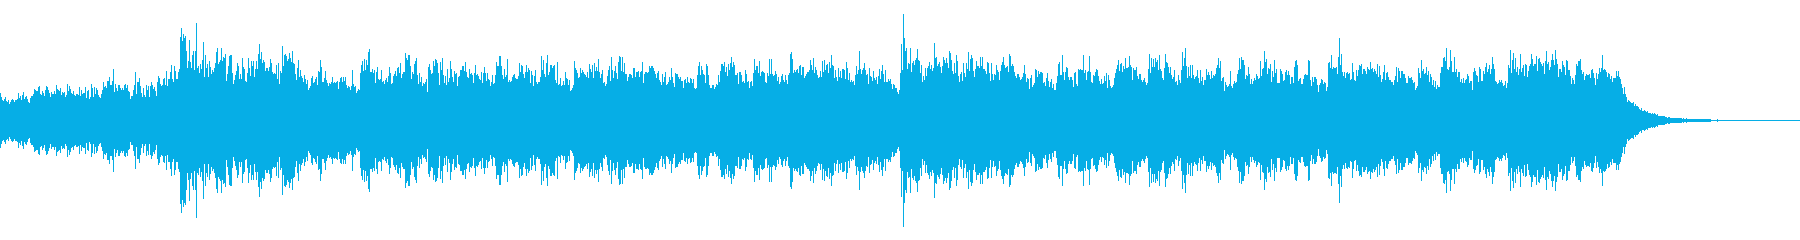 YAMATO メロディー無し_30secの再生済みの波形